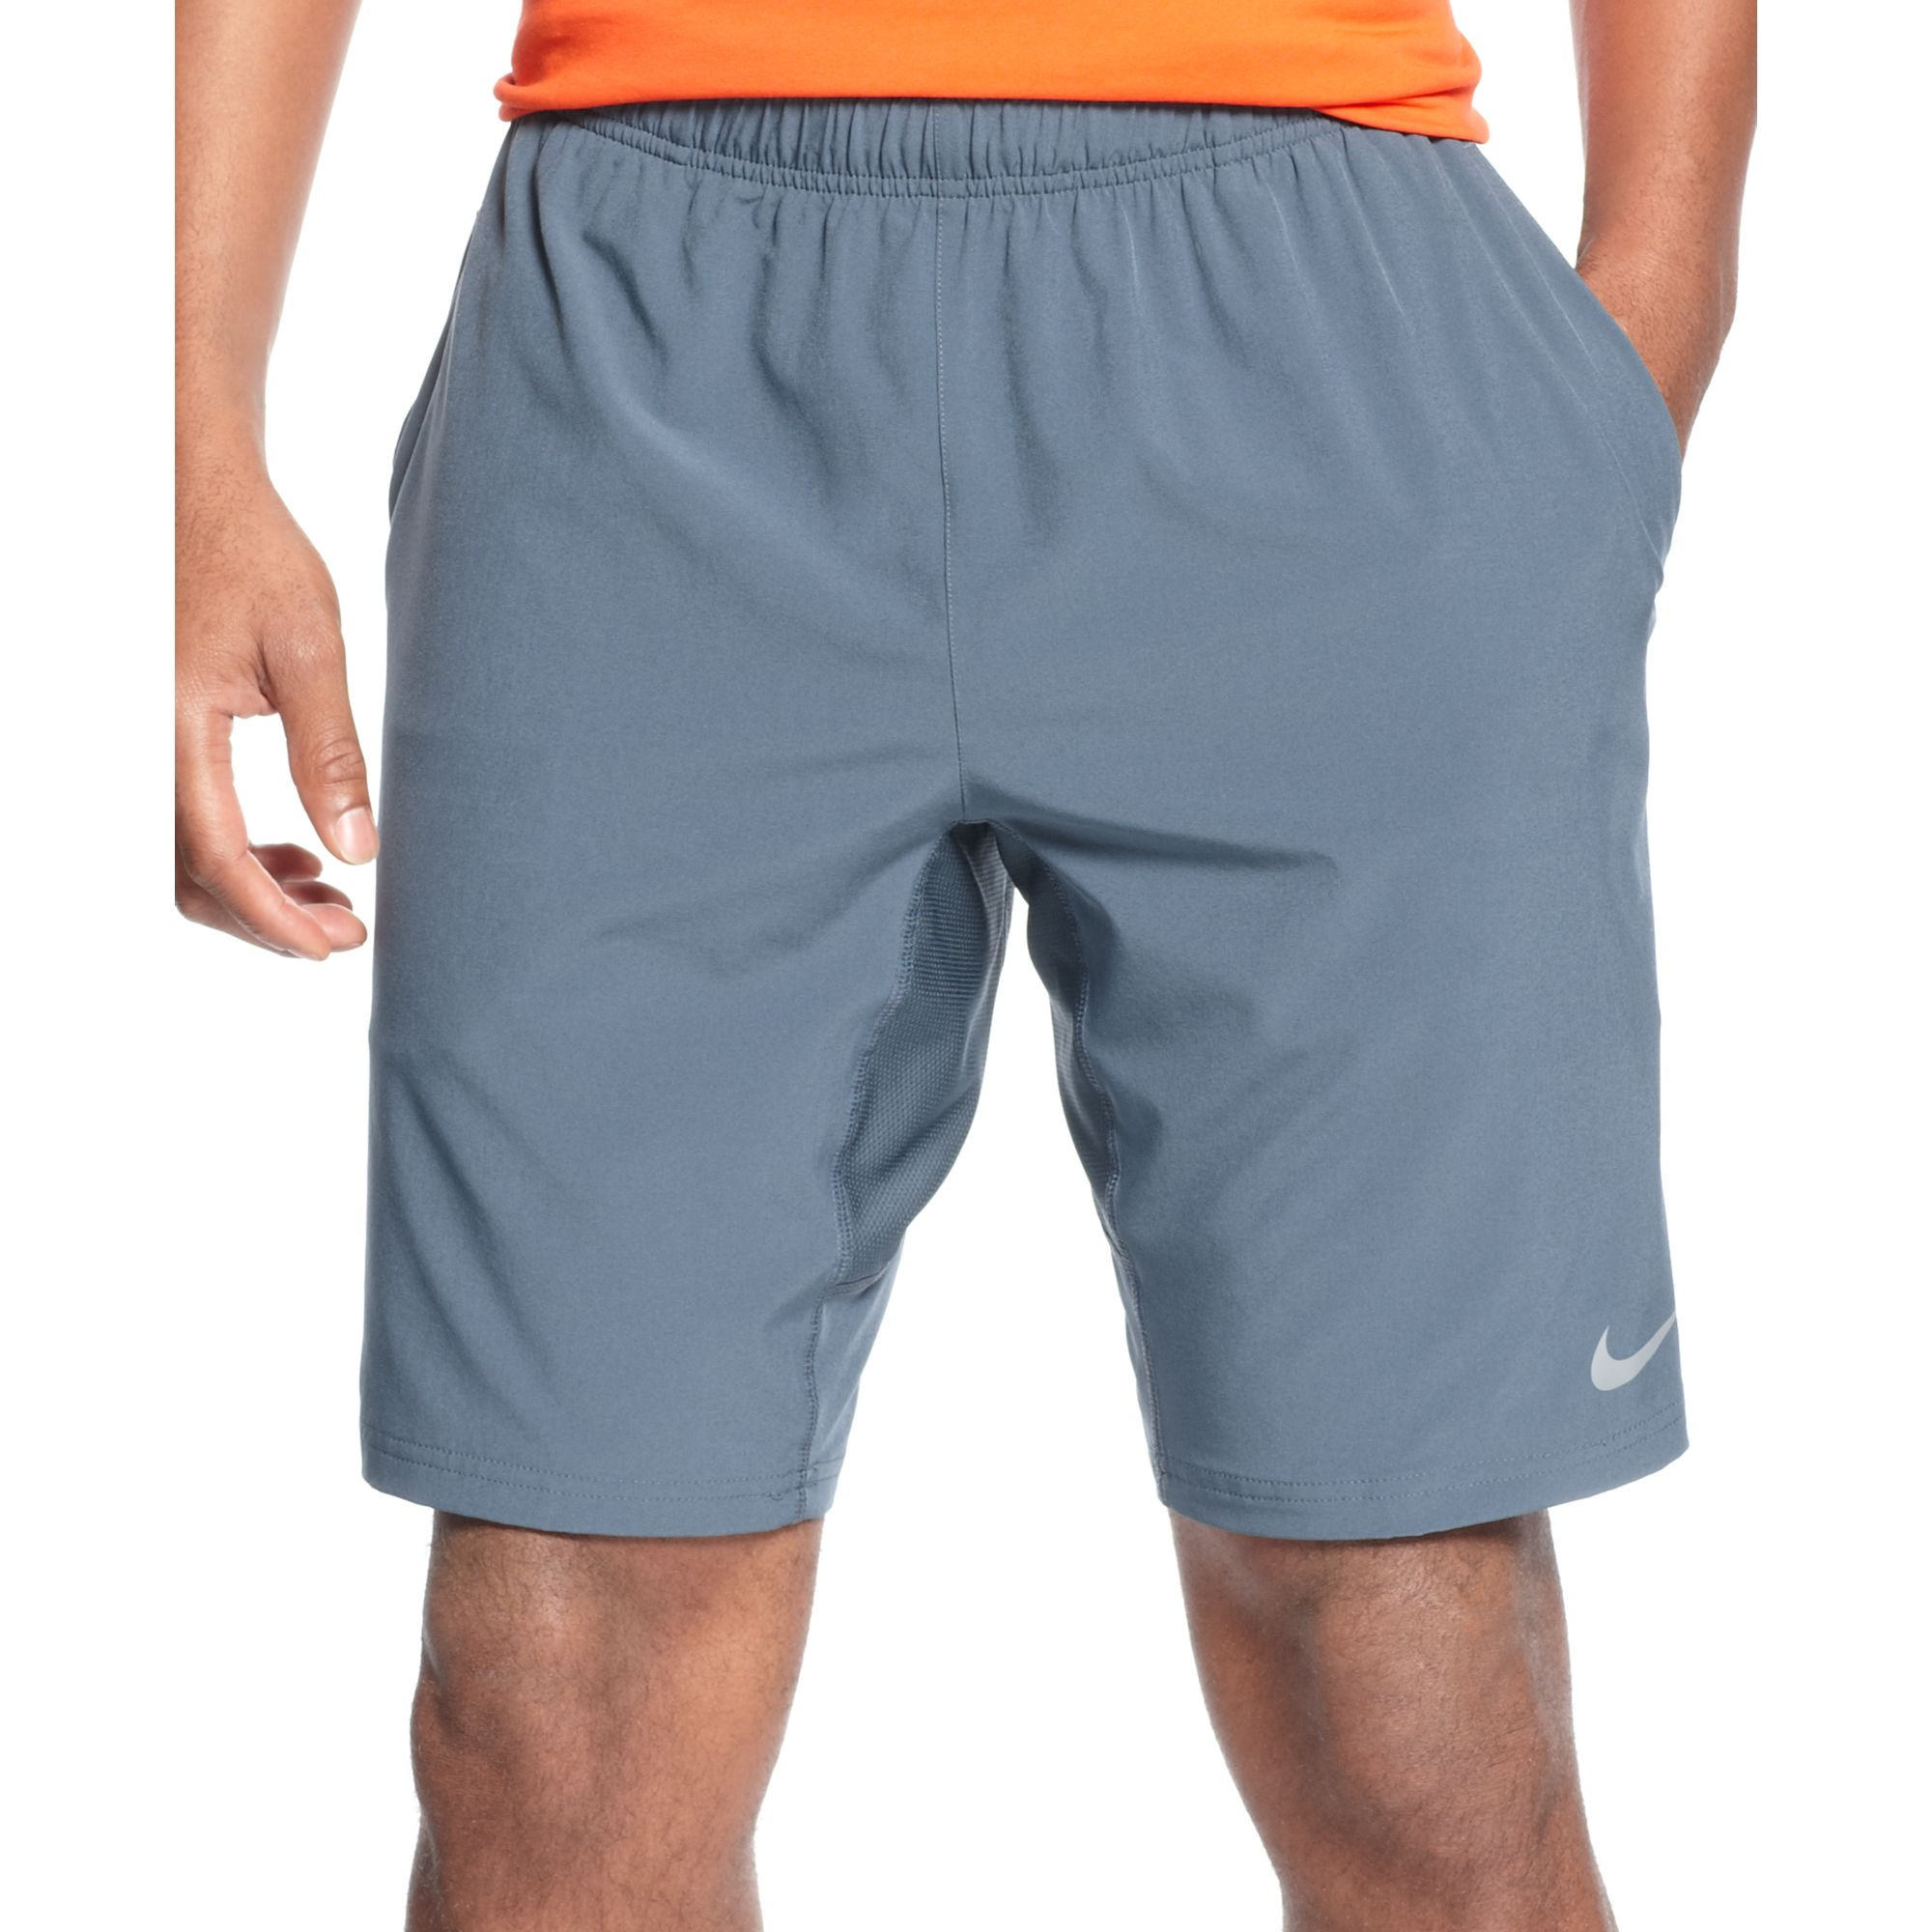 nike short tennis